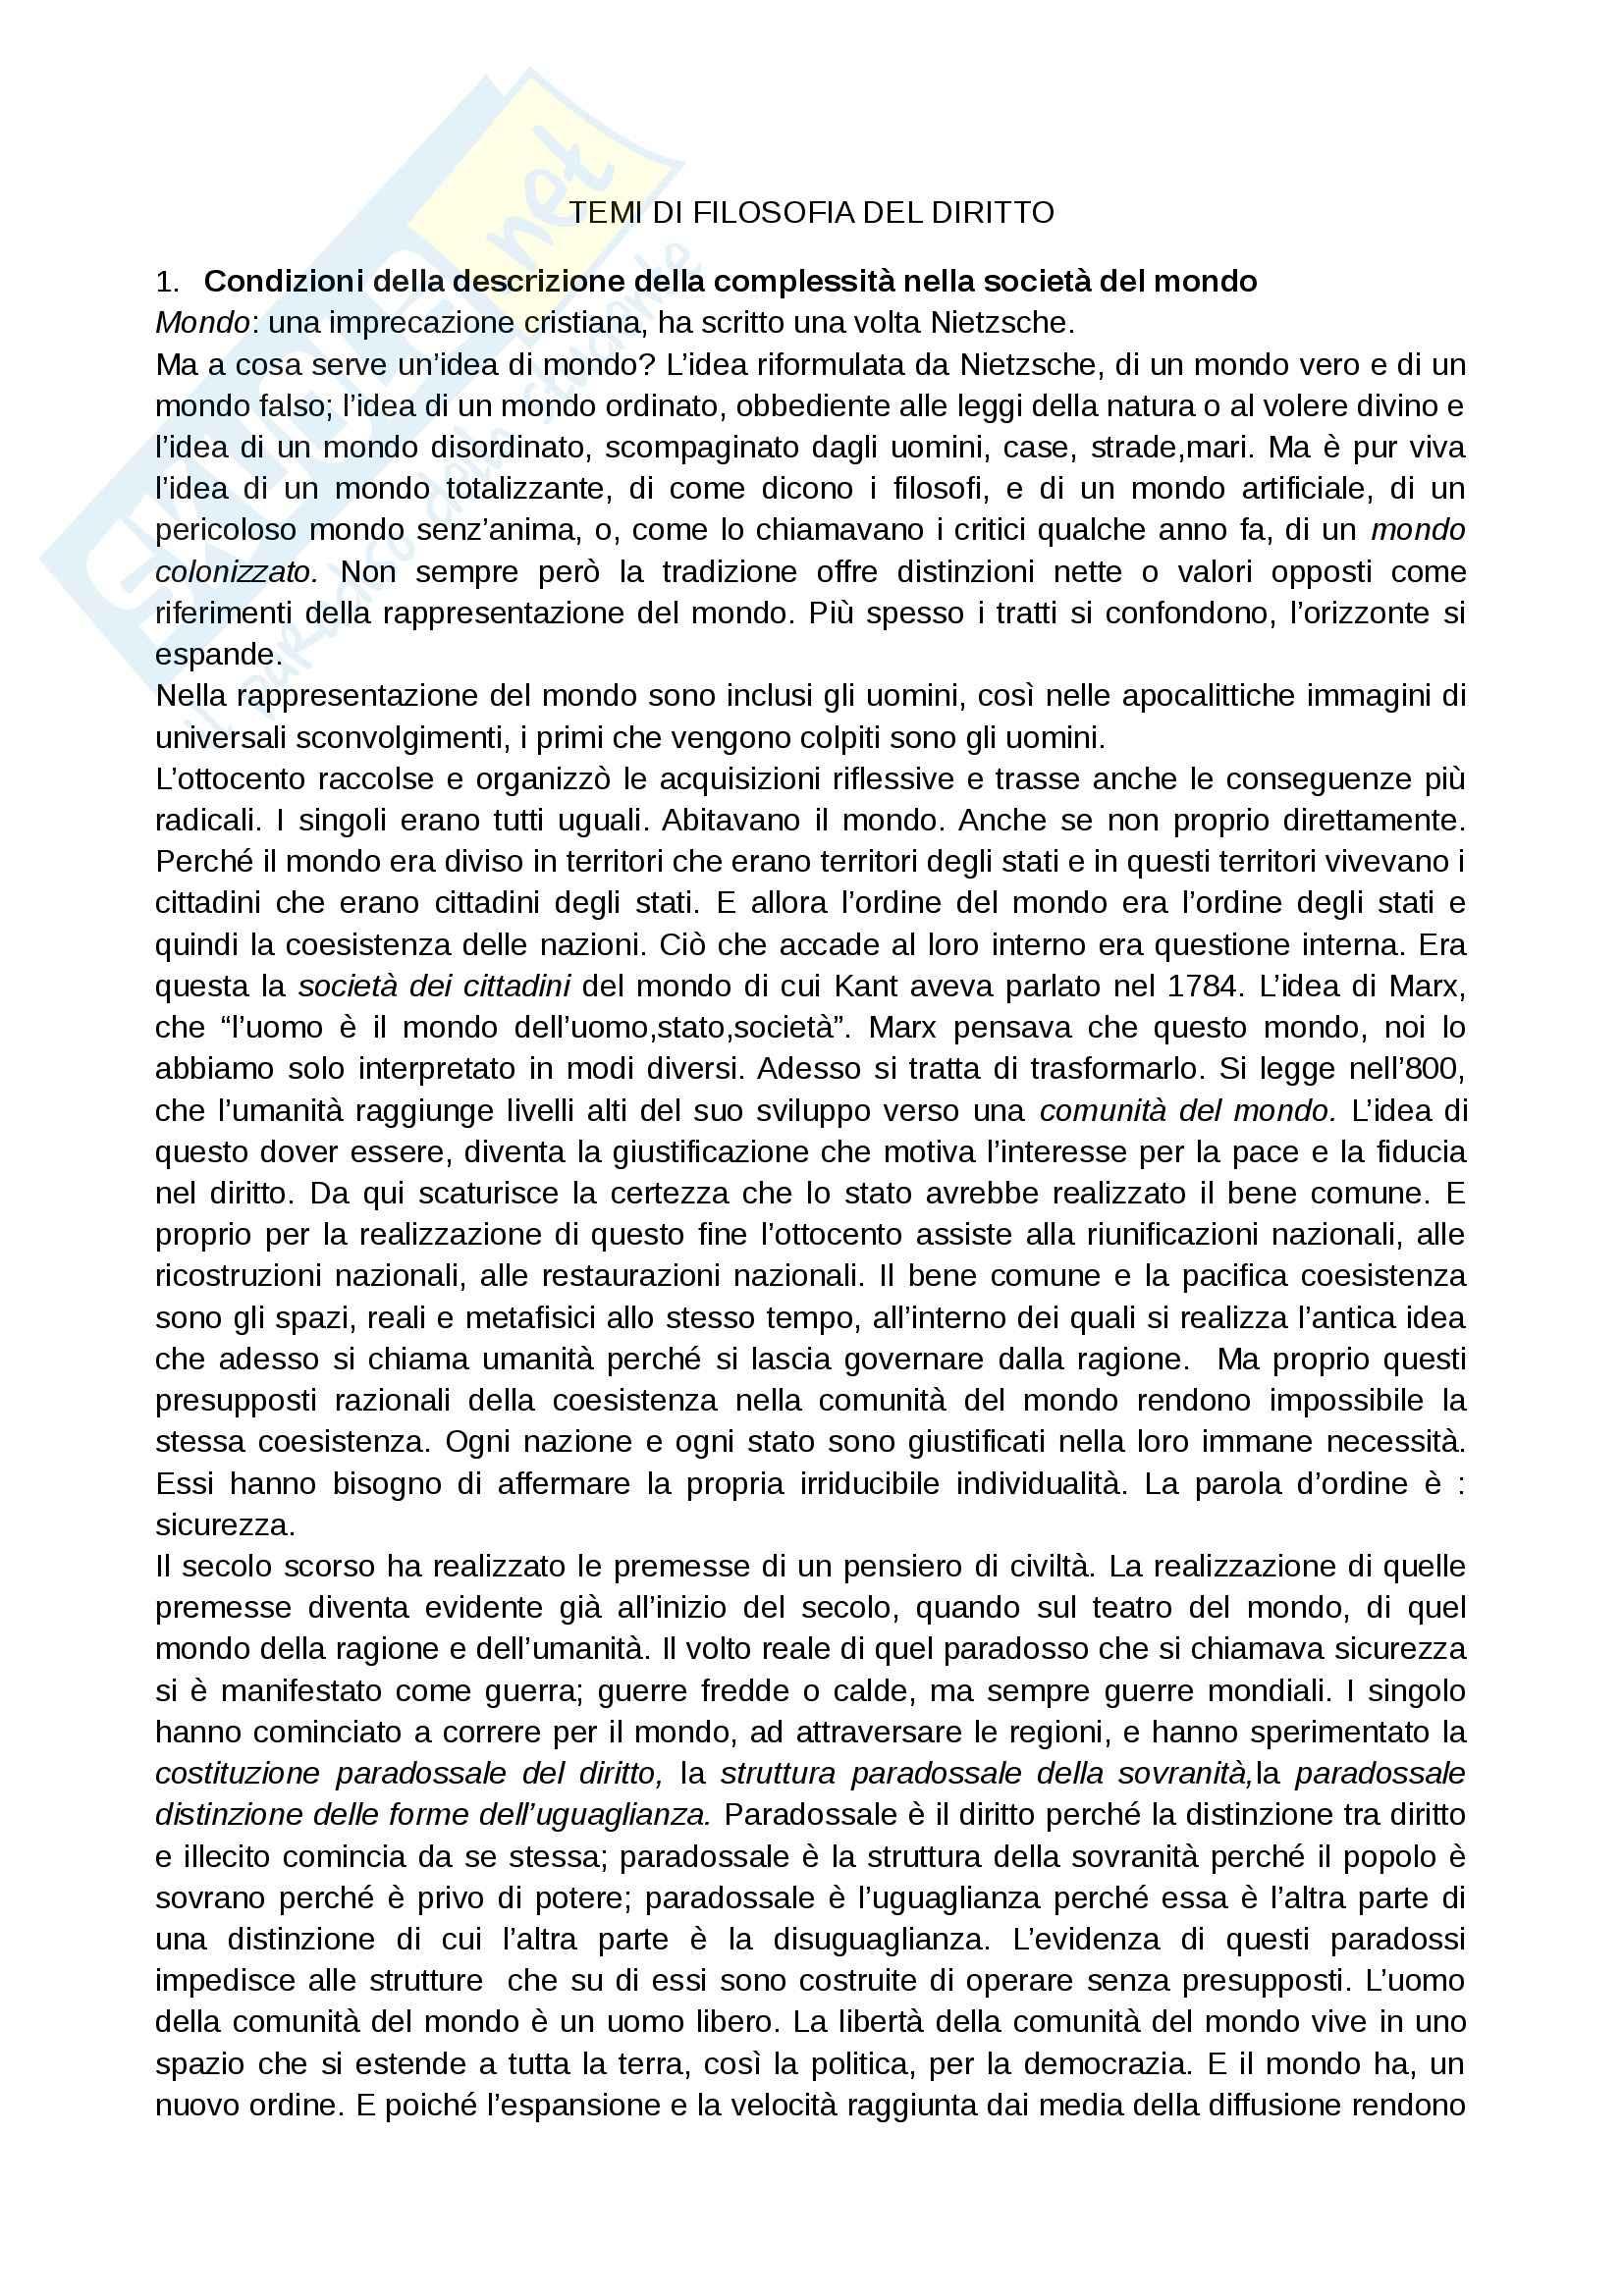 Riassunto esame Filosofia del diritto, prof. De Giorgi